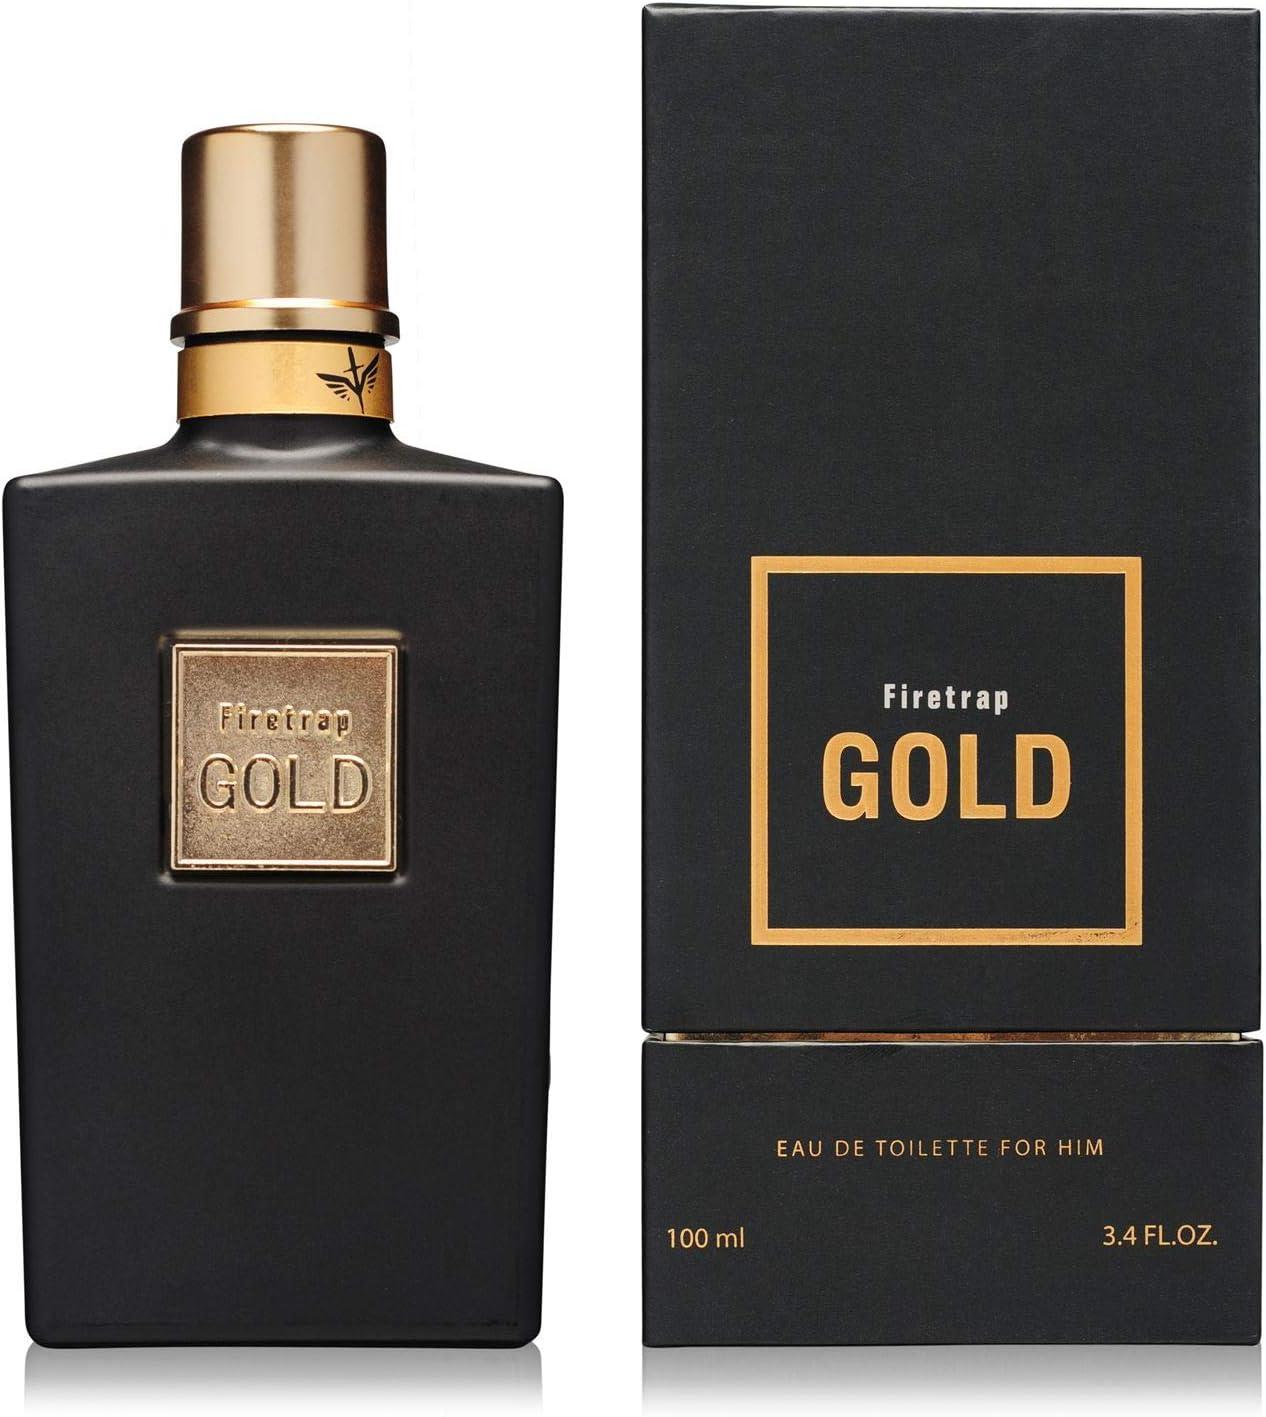 Firetrap Gold 2 Piece Fragrance Set